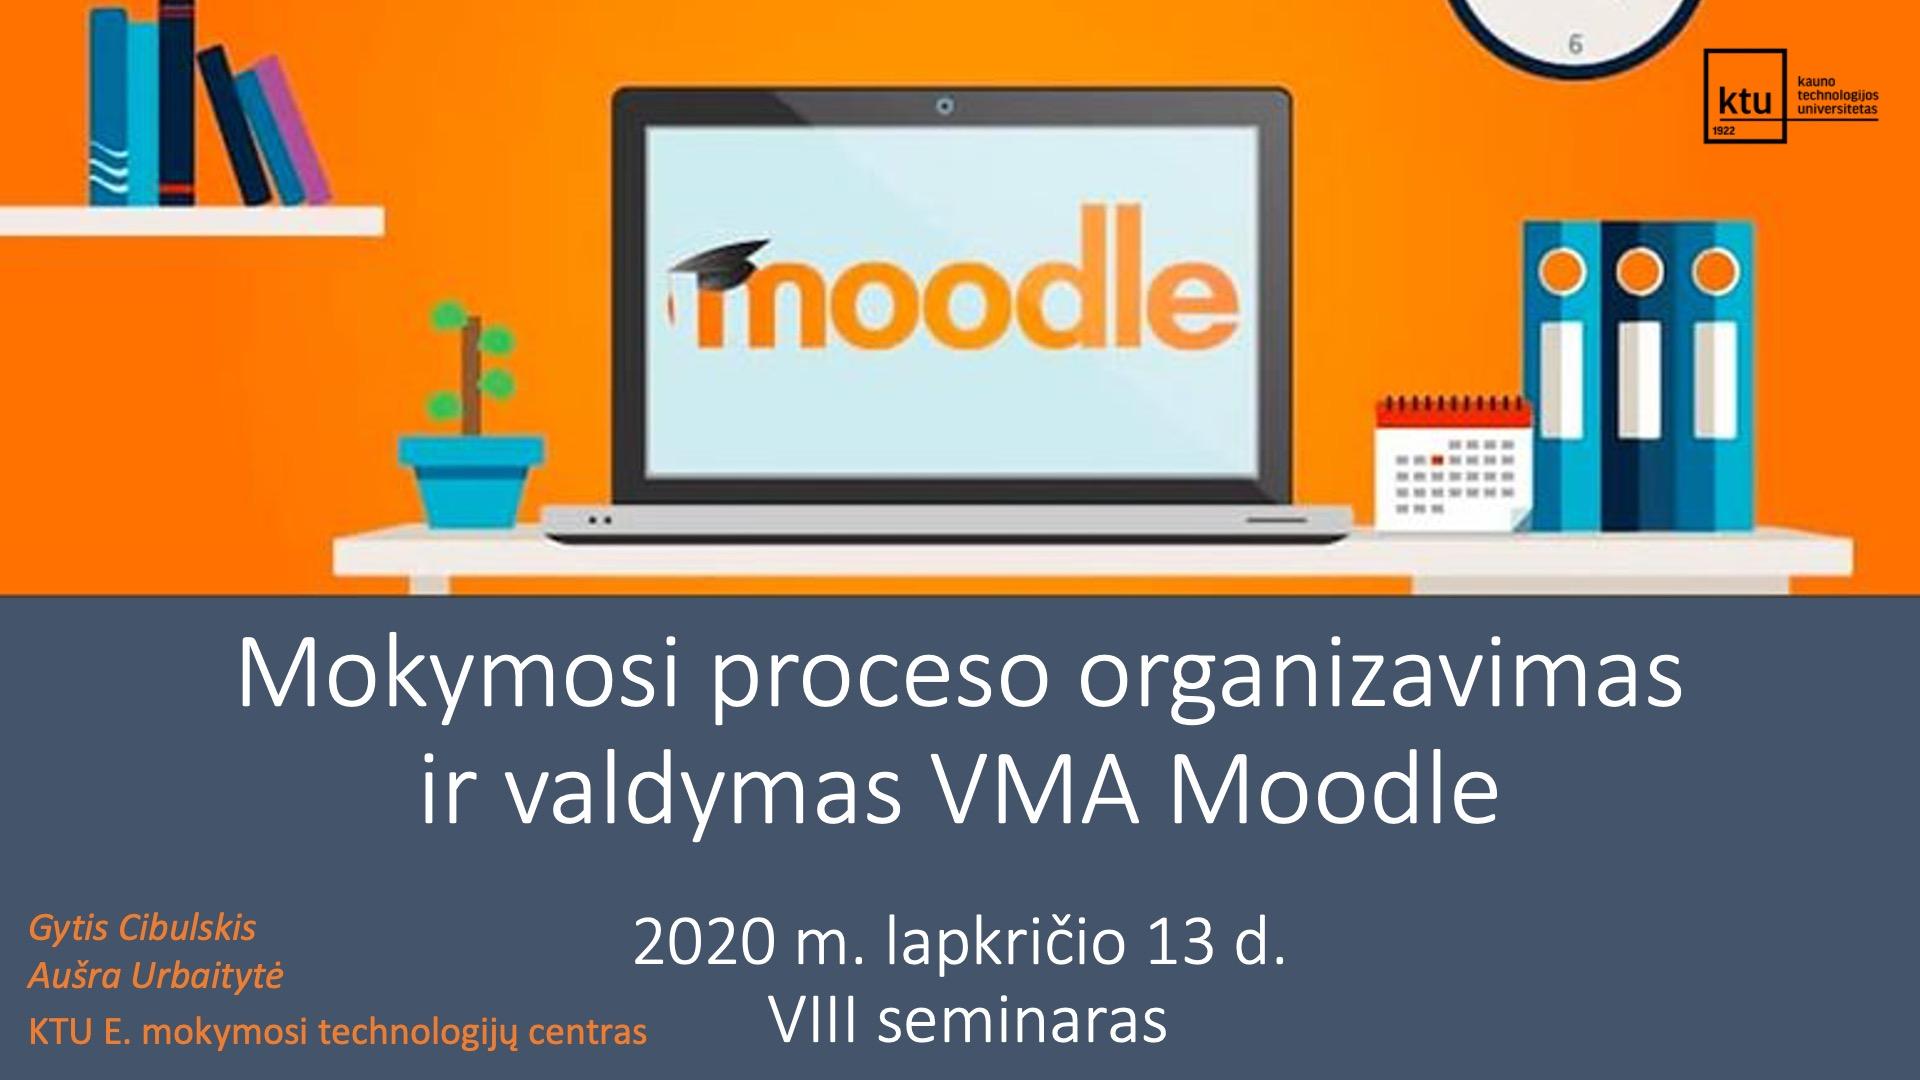 2020.11.13 Moodle mokymai (VIII seminaras)